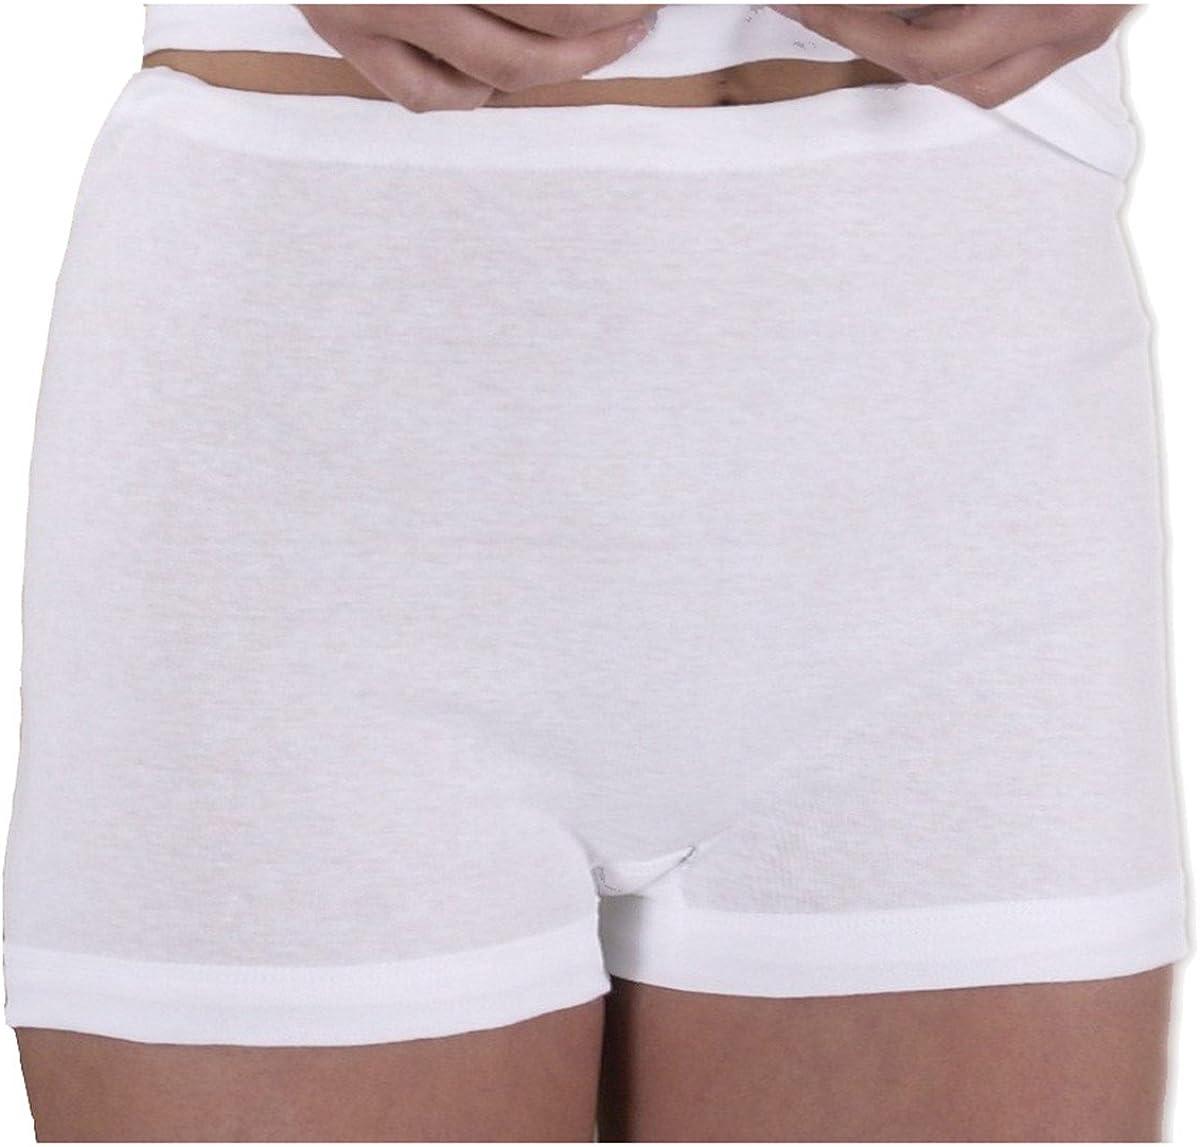 HERMKO 1650 3-Pack Ladies Full-Brief Knickers in 100/% Cotton